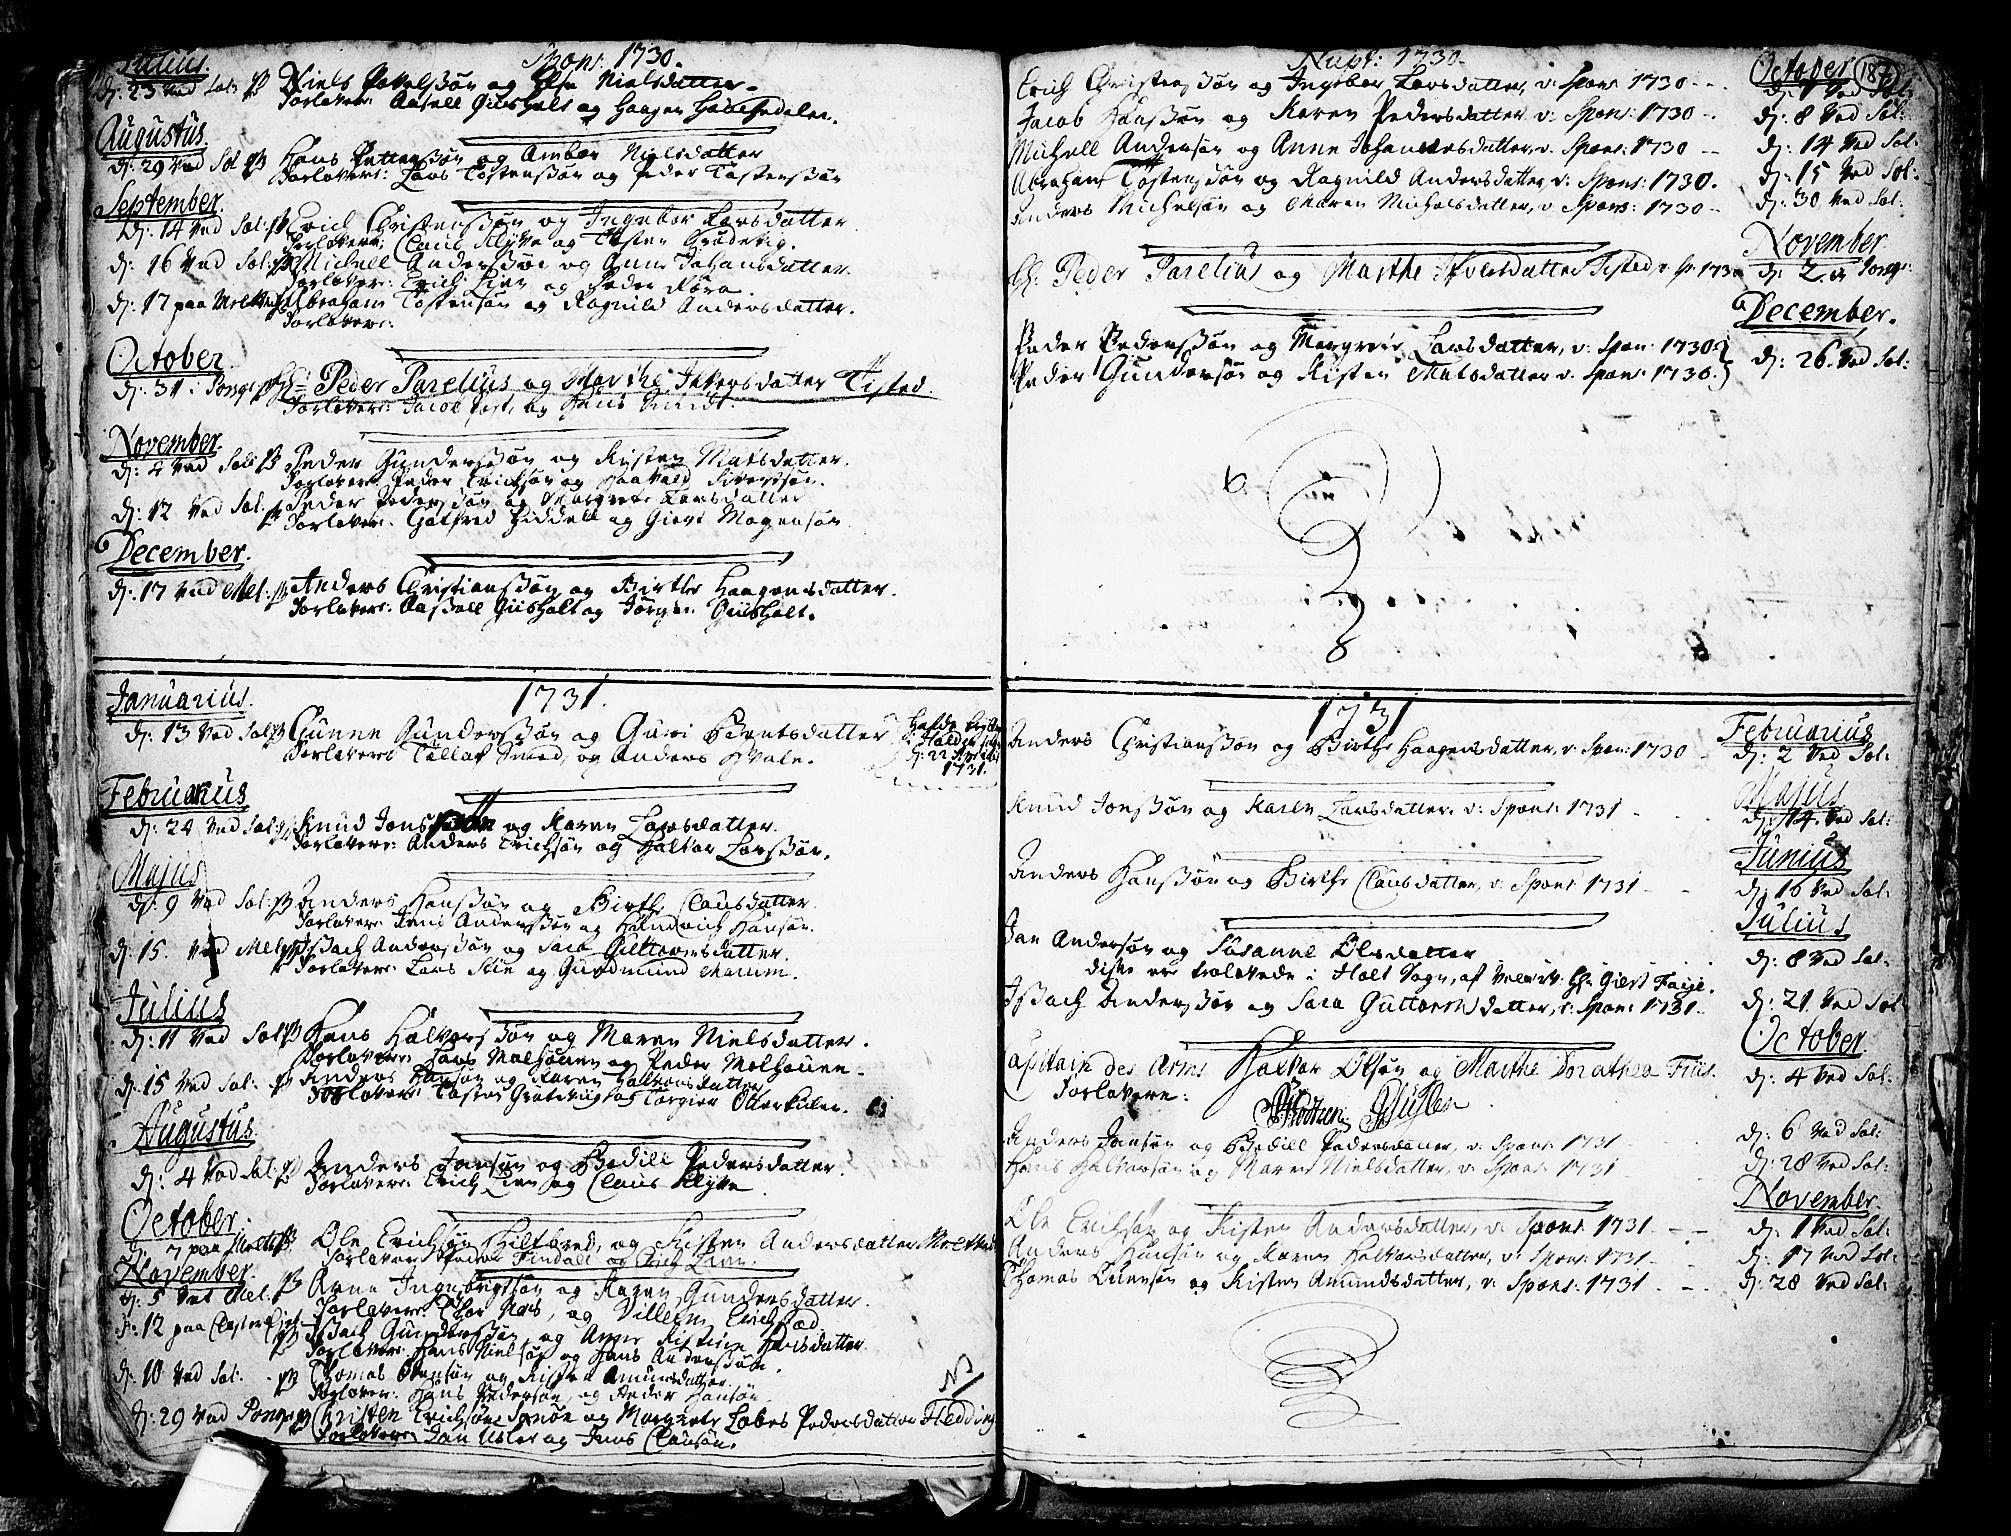 SAKO, Solum kirkebøker, F/Fa/L0002: Ministerialbok nr. I 2, 1713-1761, s. 187